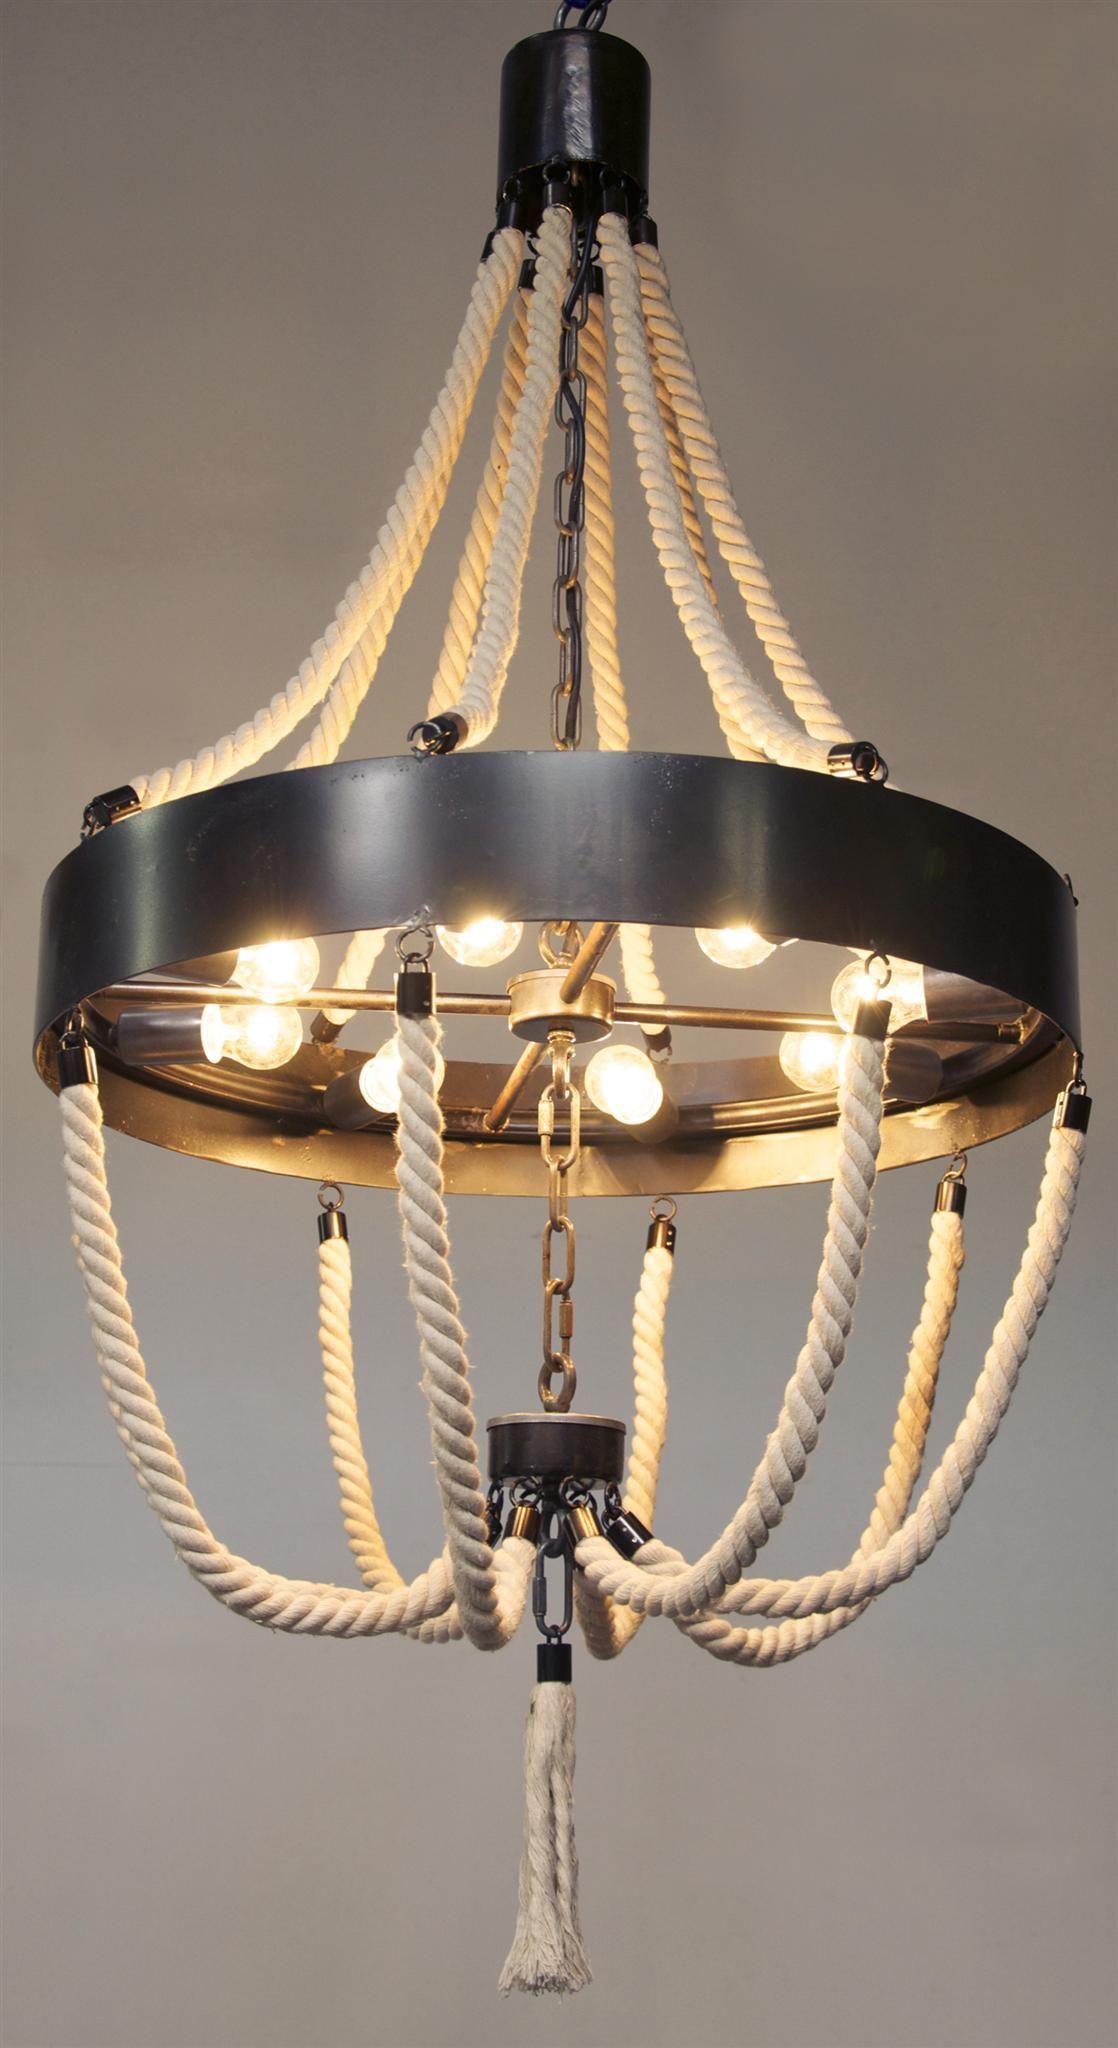 wagon wheel chandeliers Google Search